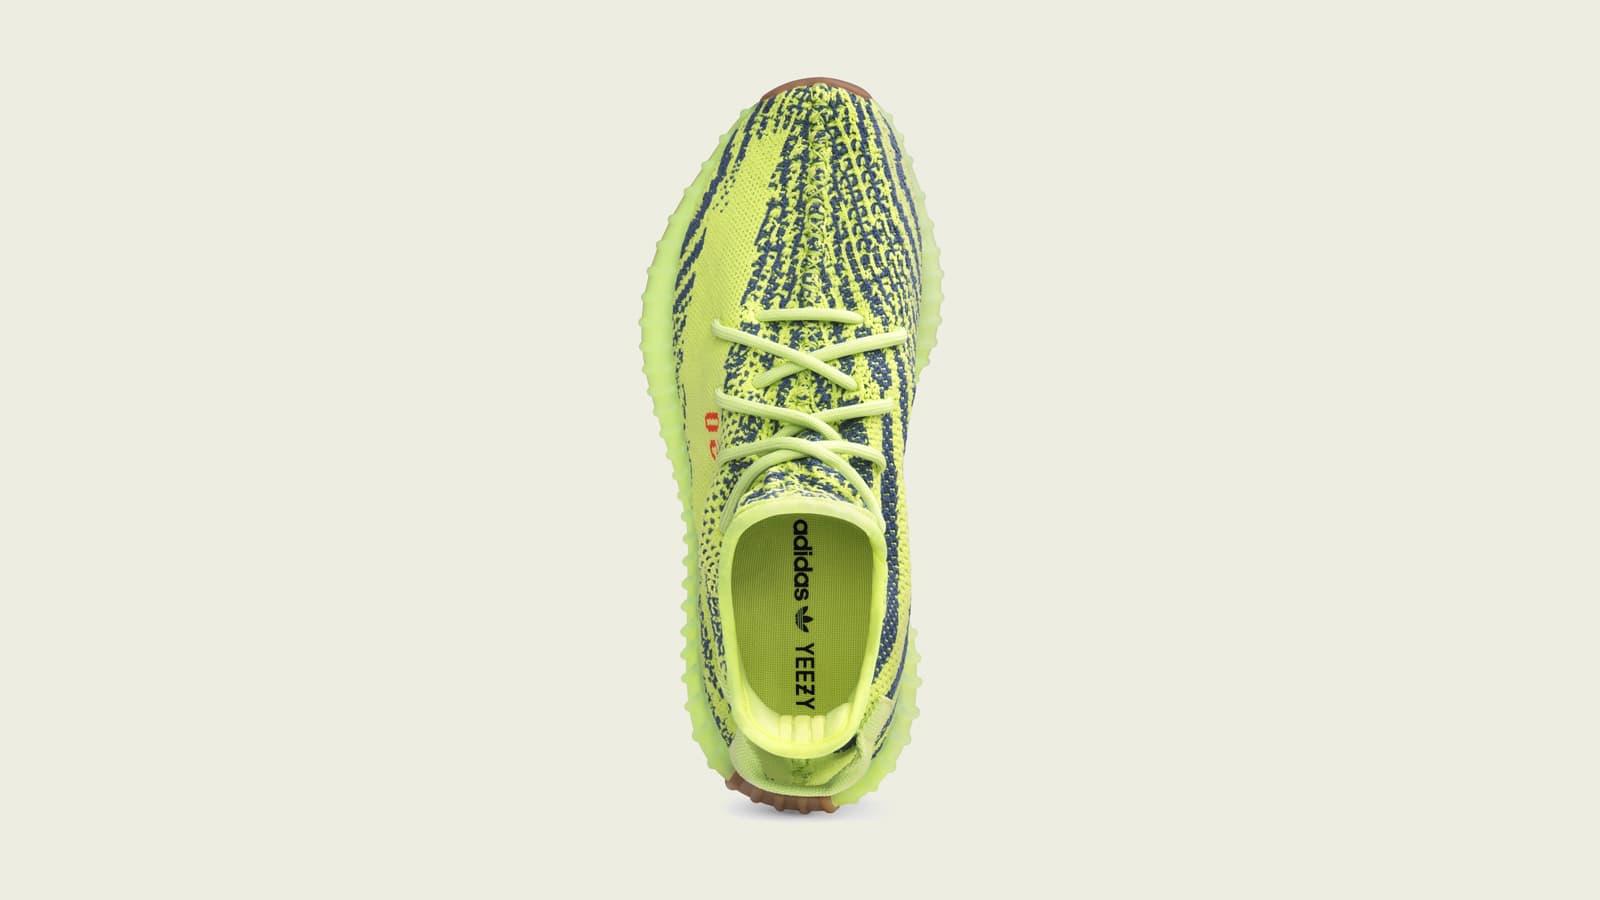 adidas X Yeezy Yellow Boost 350 V2 Semi Frozen Shoes